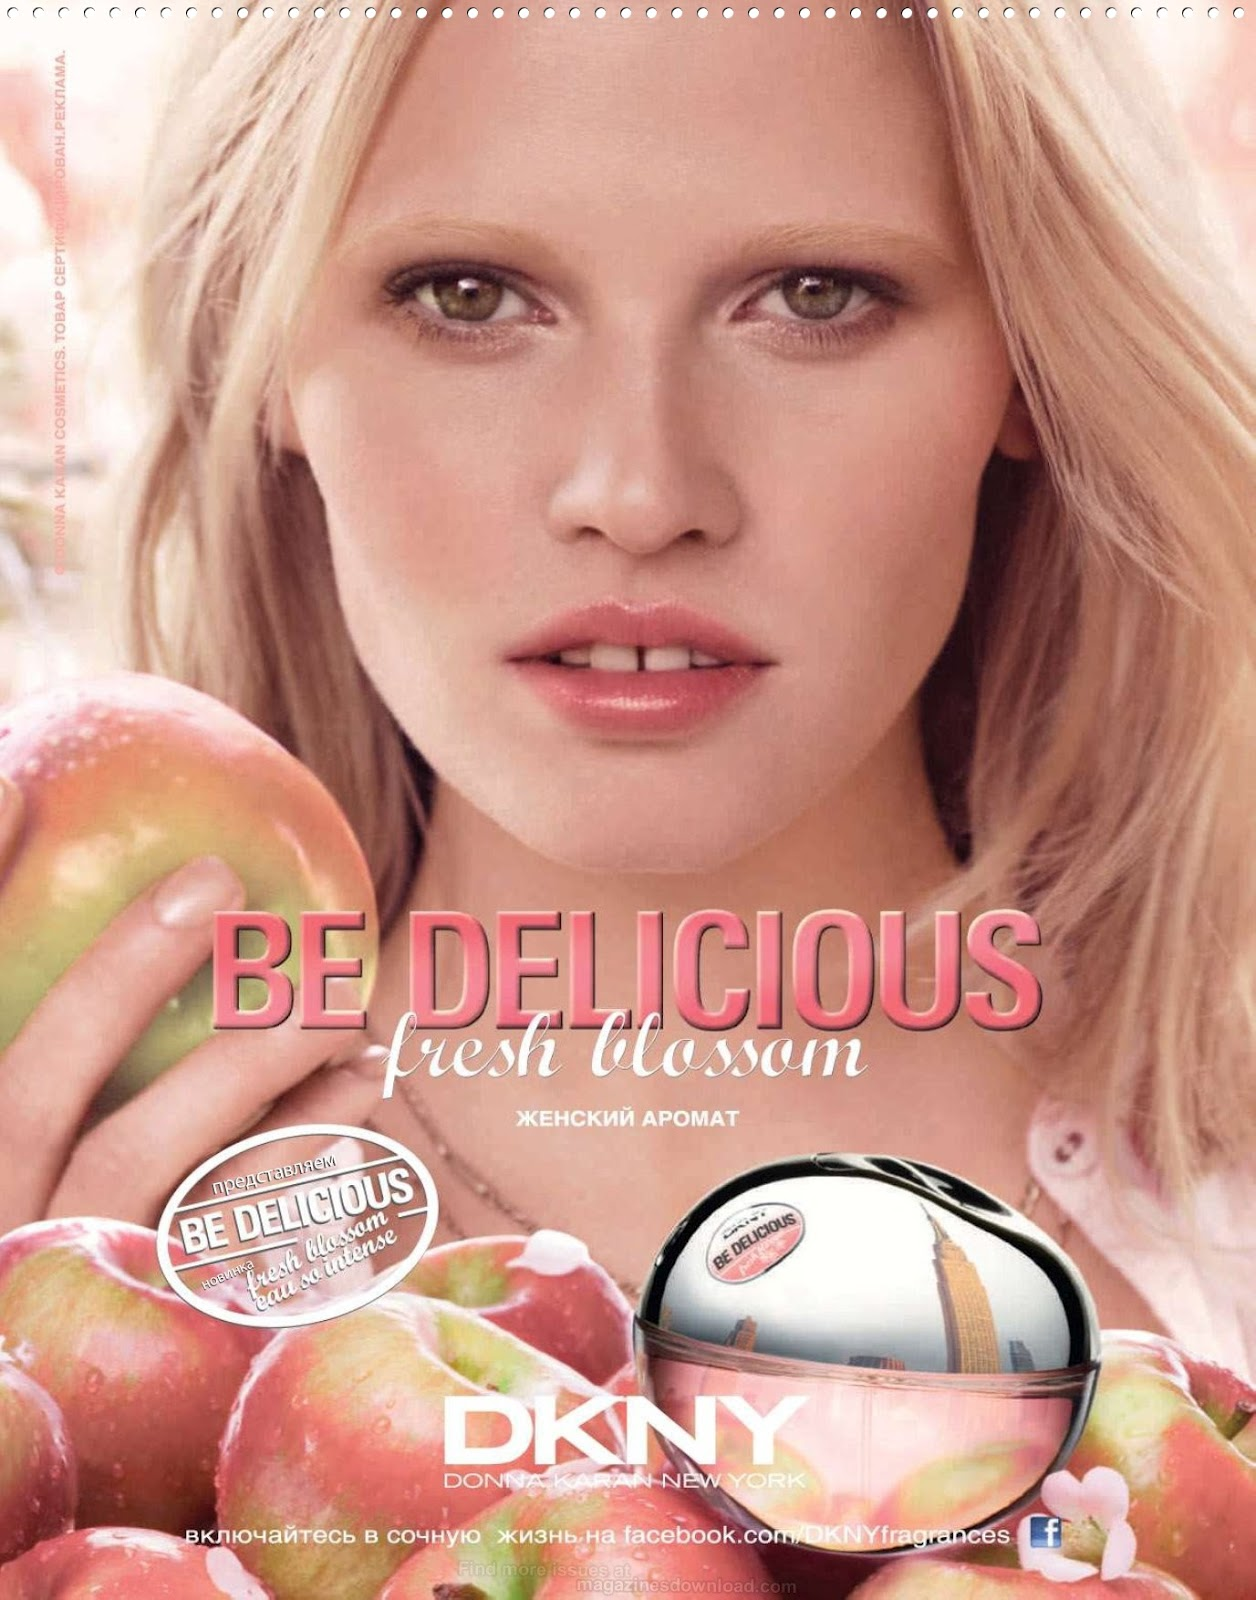 http://1.bp.blogspot.com/-hqukf3BwjIQ/T-hvg7g-ZSI/AAAAAAAADDY/GW_YVylrYTo/s1600/_Lara+Stone+-+DKNY+Be+Delicious+Fresh+Blossom.jpg